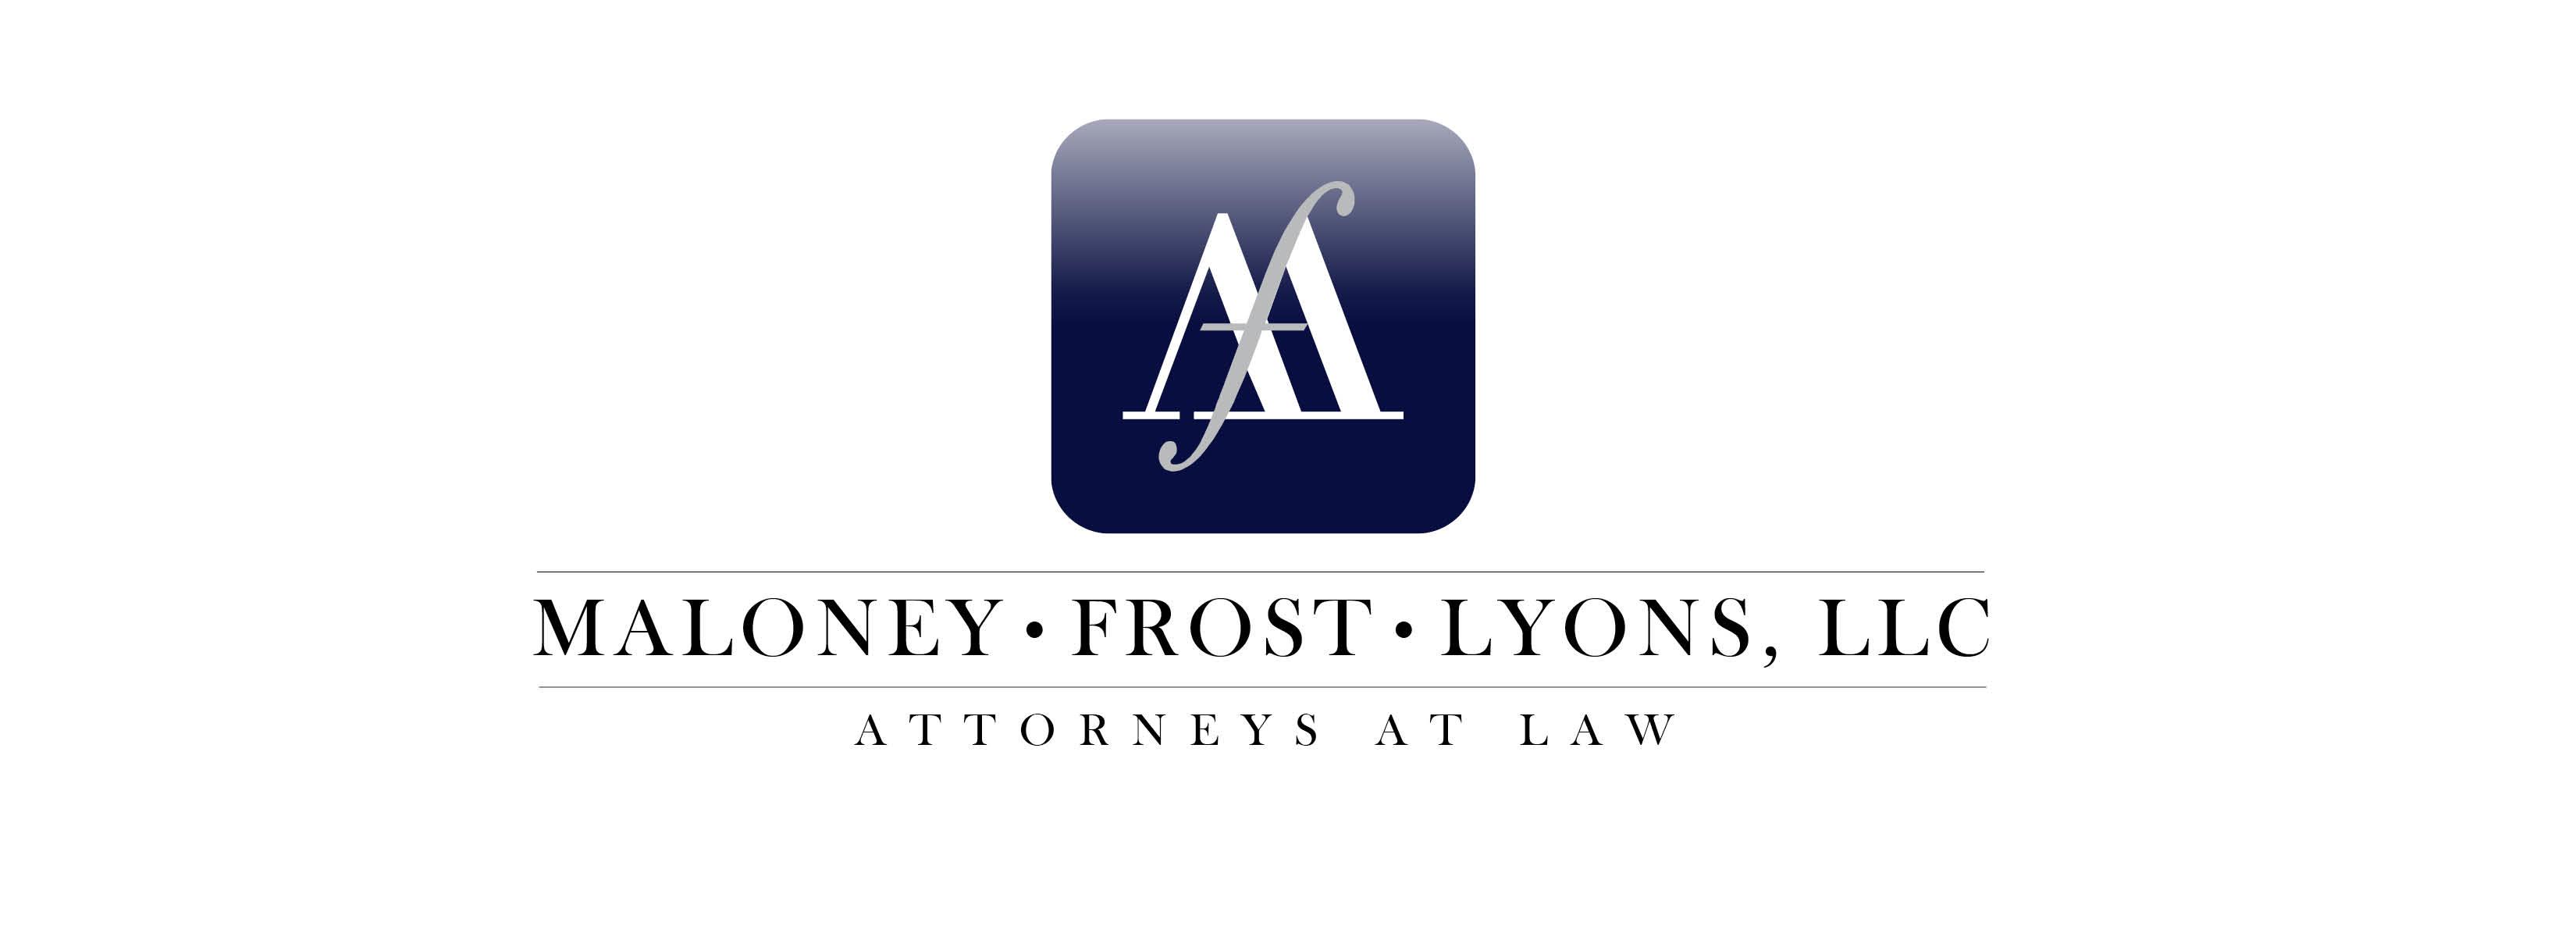 Maloney*Frost*Lyons, LLC